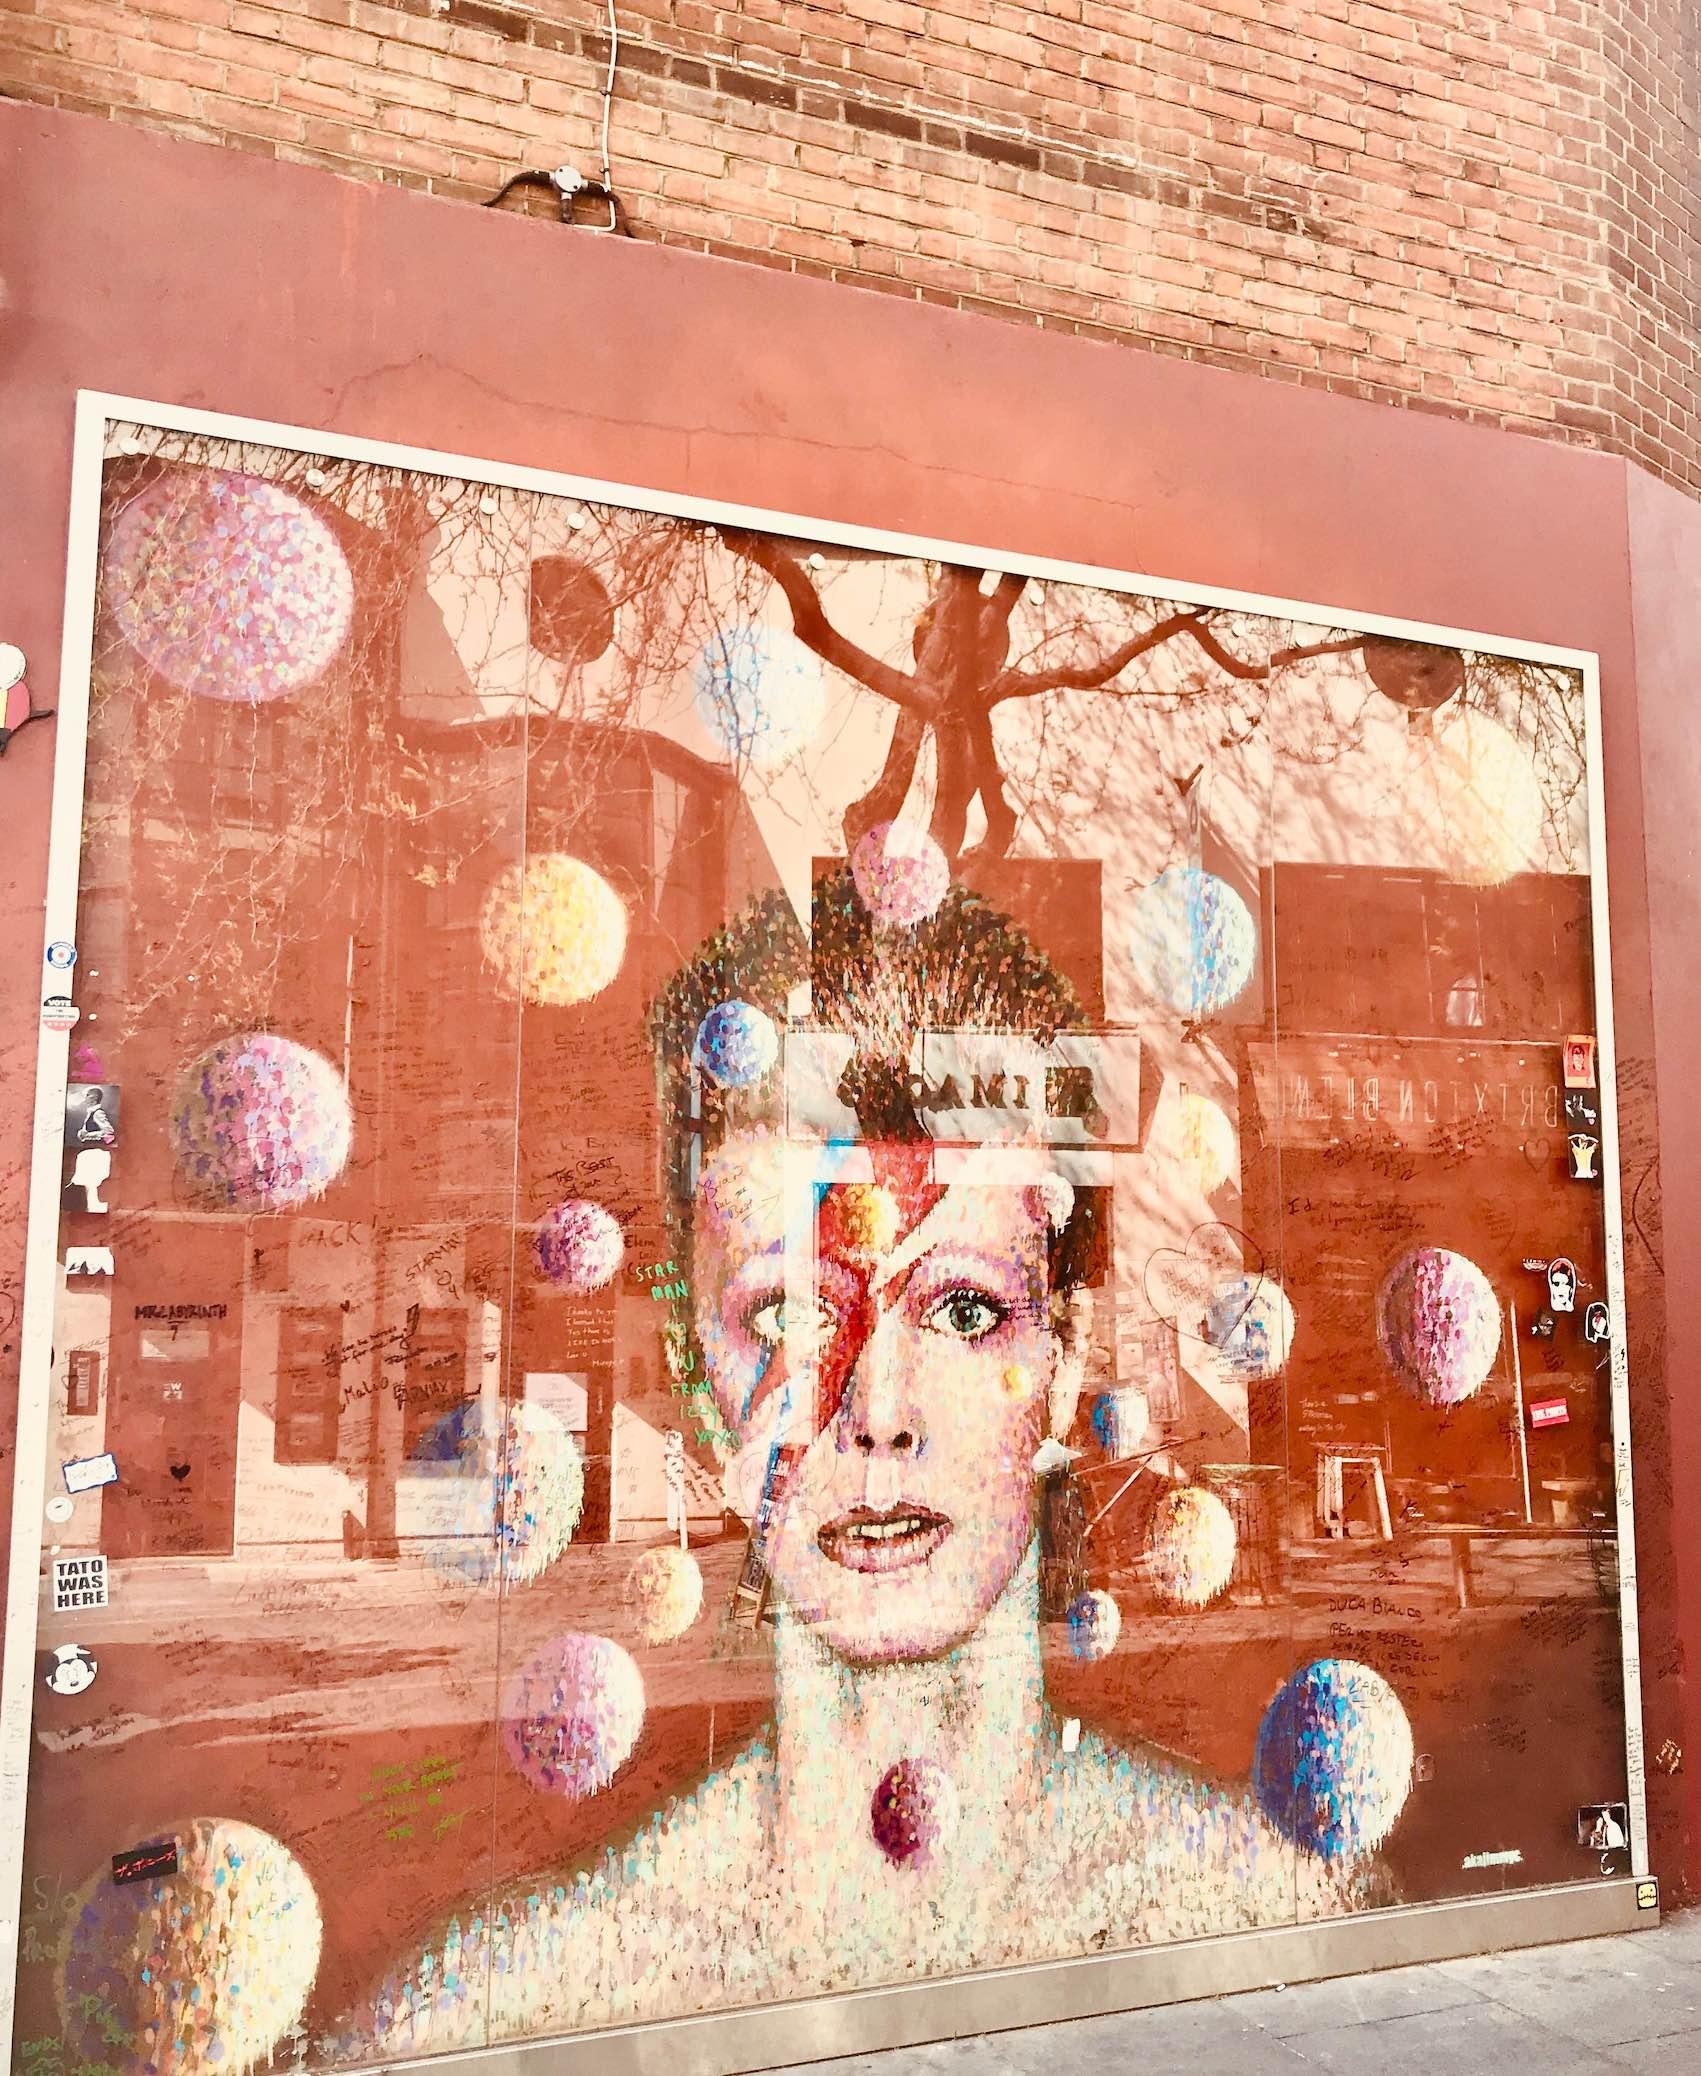 David Bowie Mural.